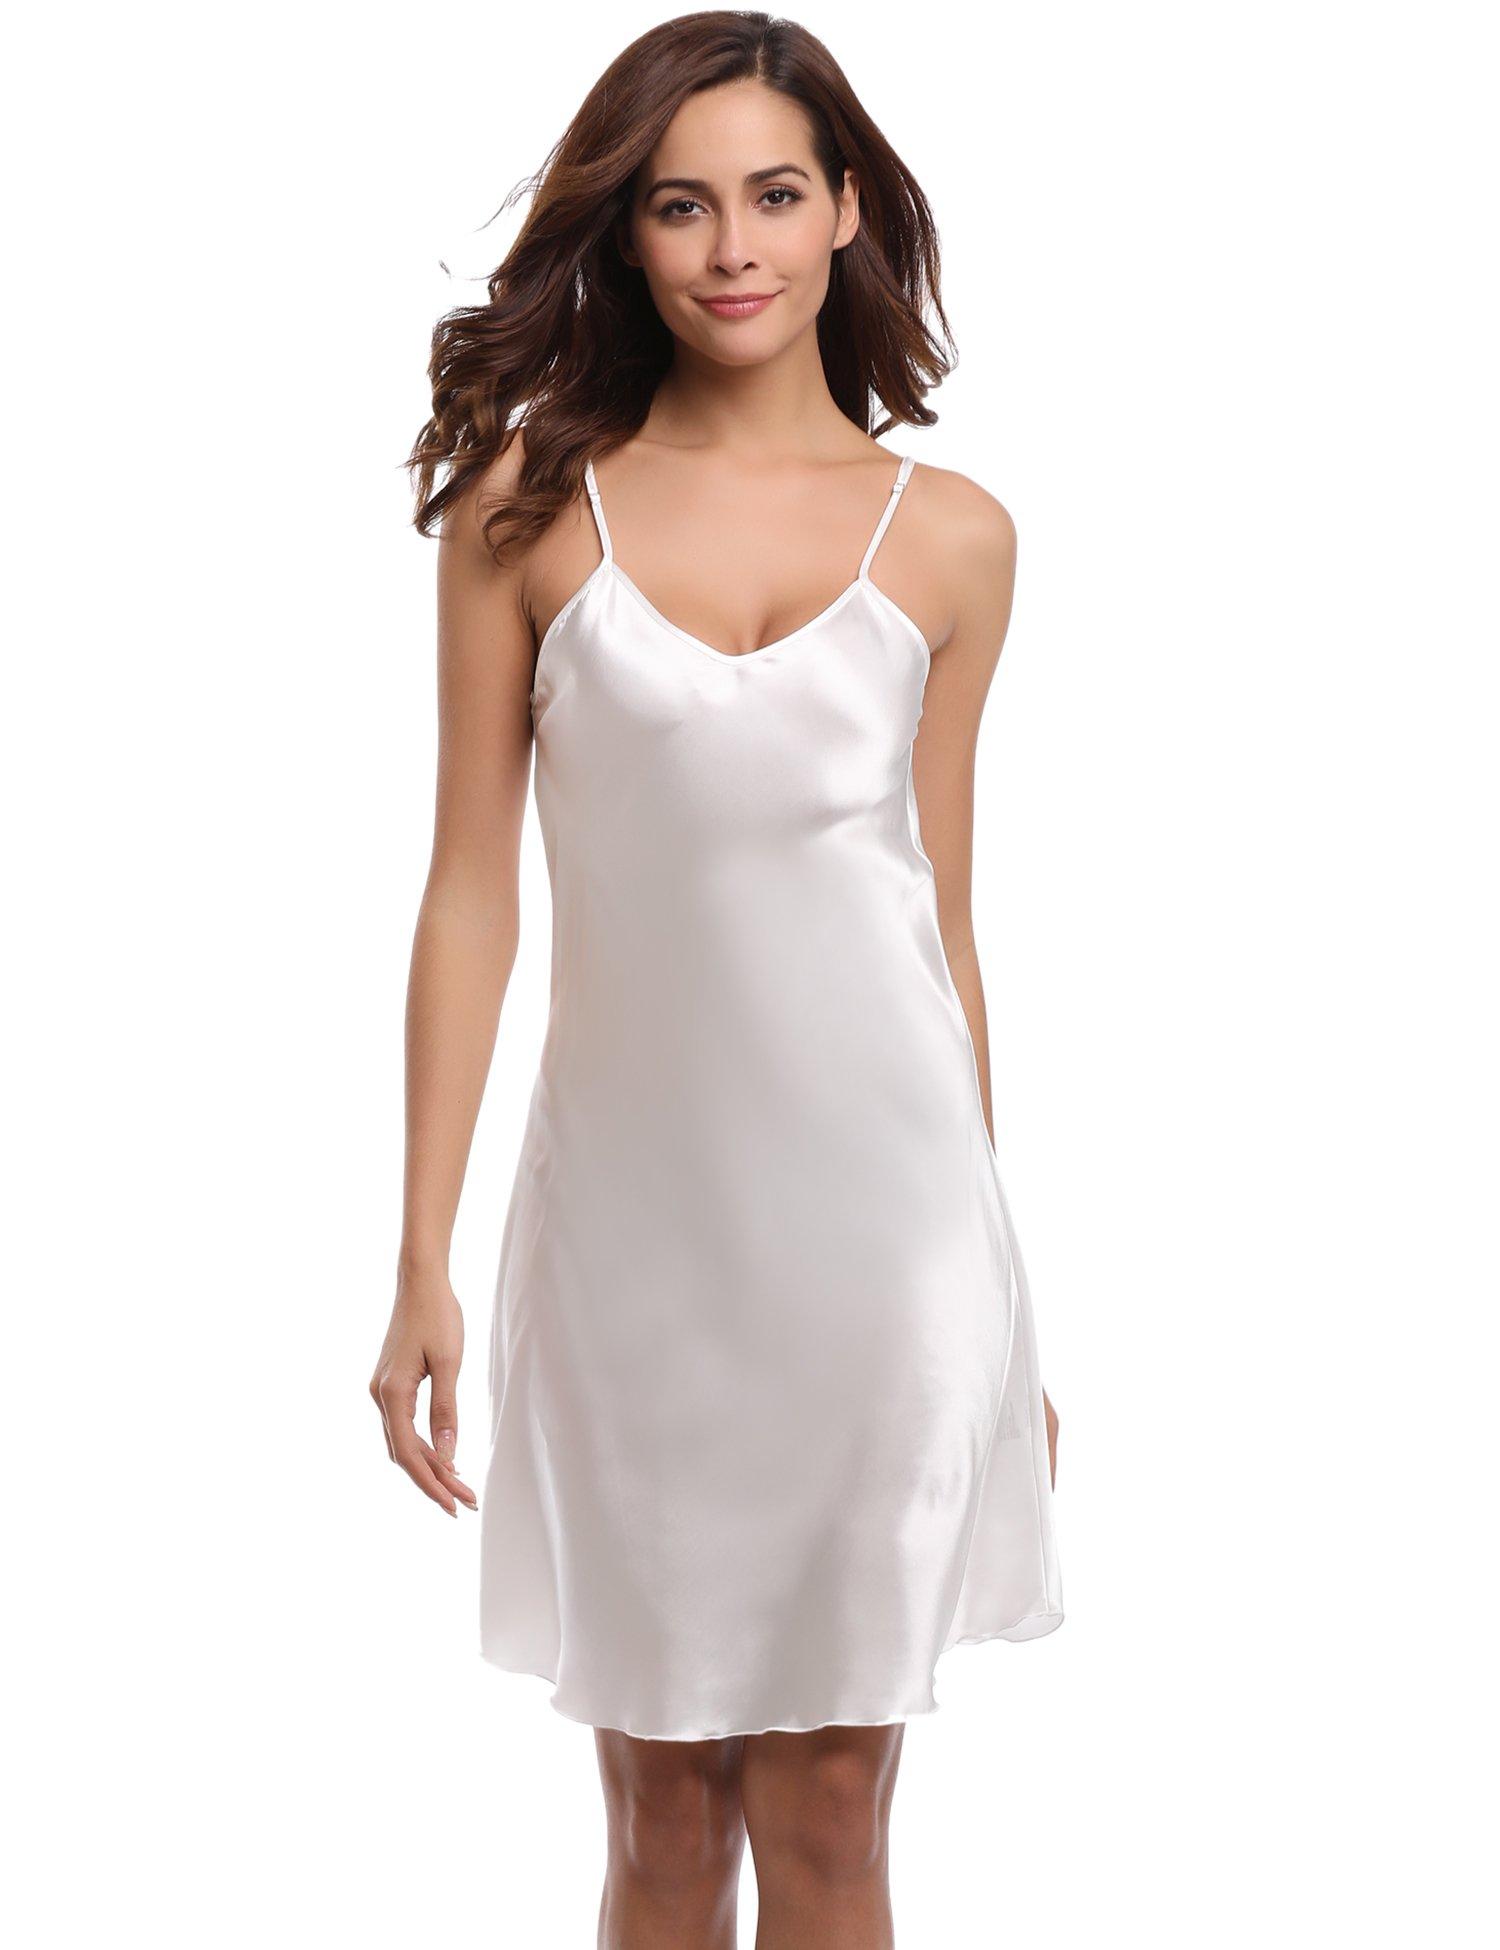 Aiboria Nightgowns for Women Satin Chemise Slip Sleepwear Nightshirt Sexy V Neck Spaghetti Strap